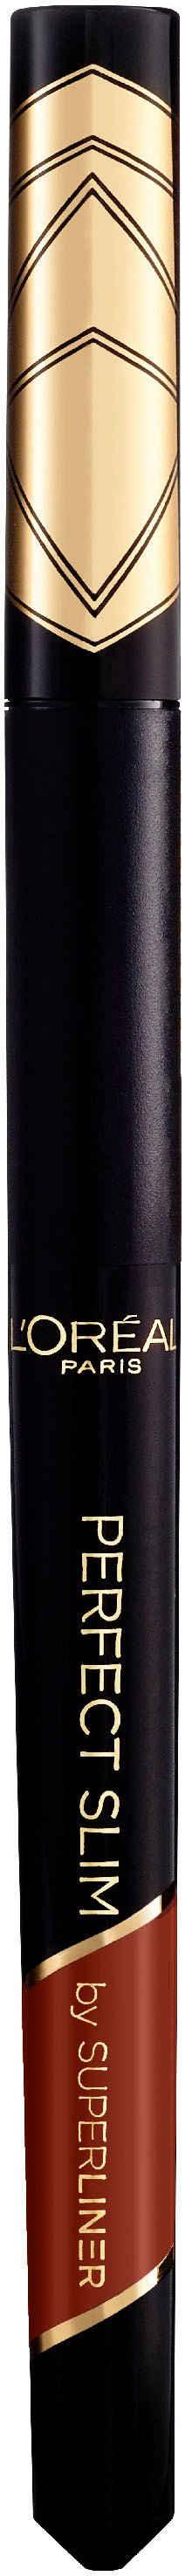 L'ORÉAL PARIS Eyeliner »Super Liner Perfect Slim«